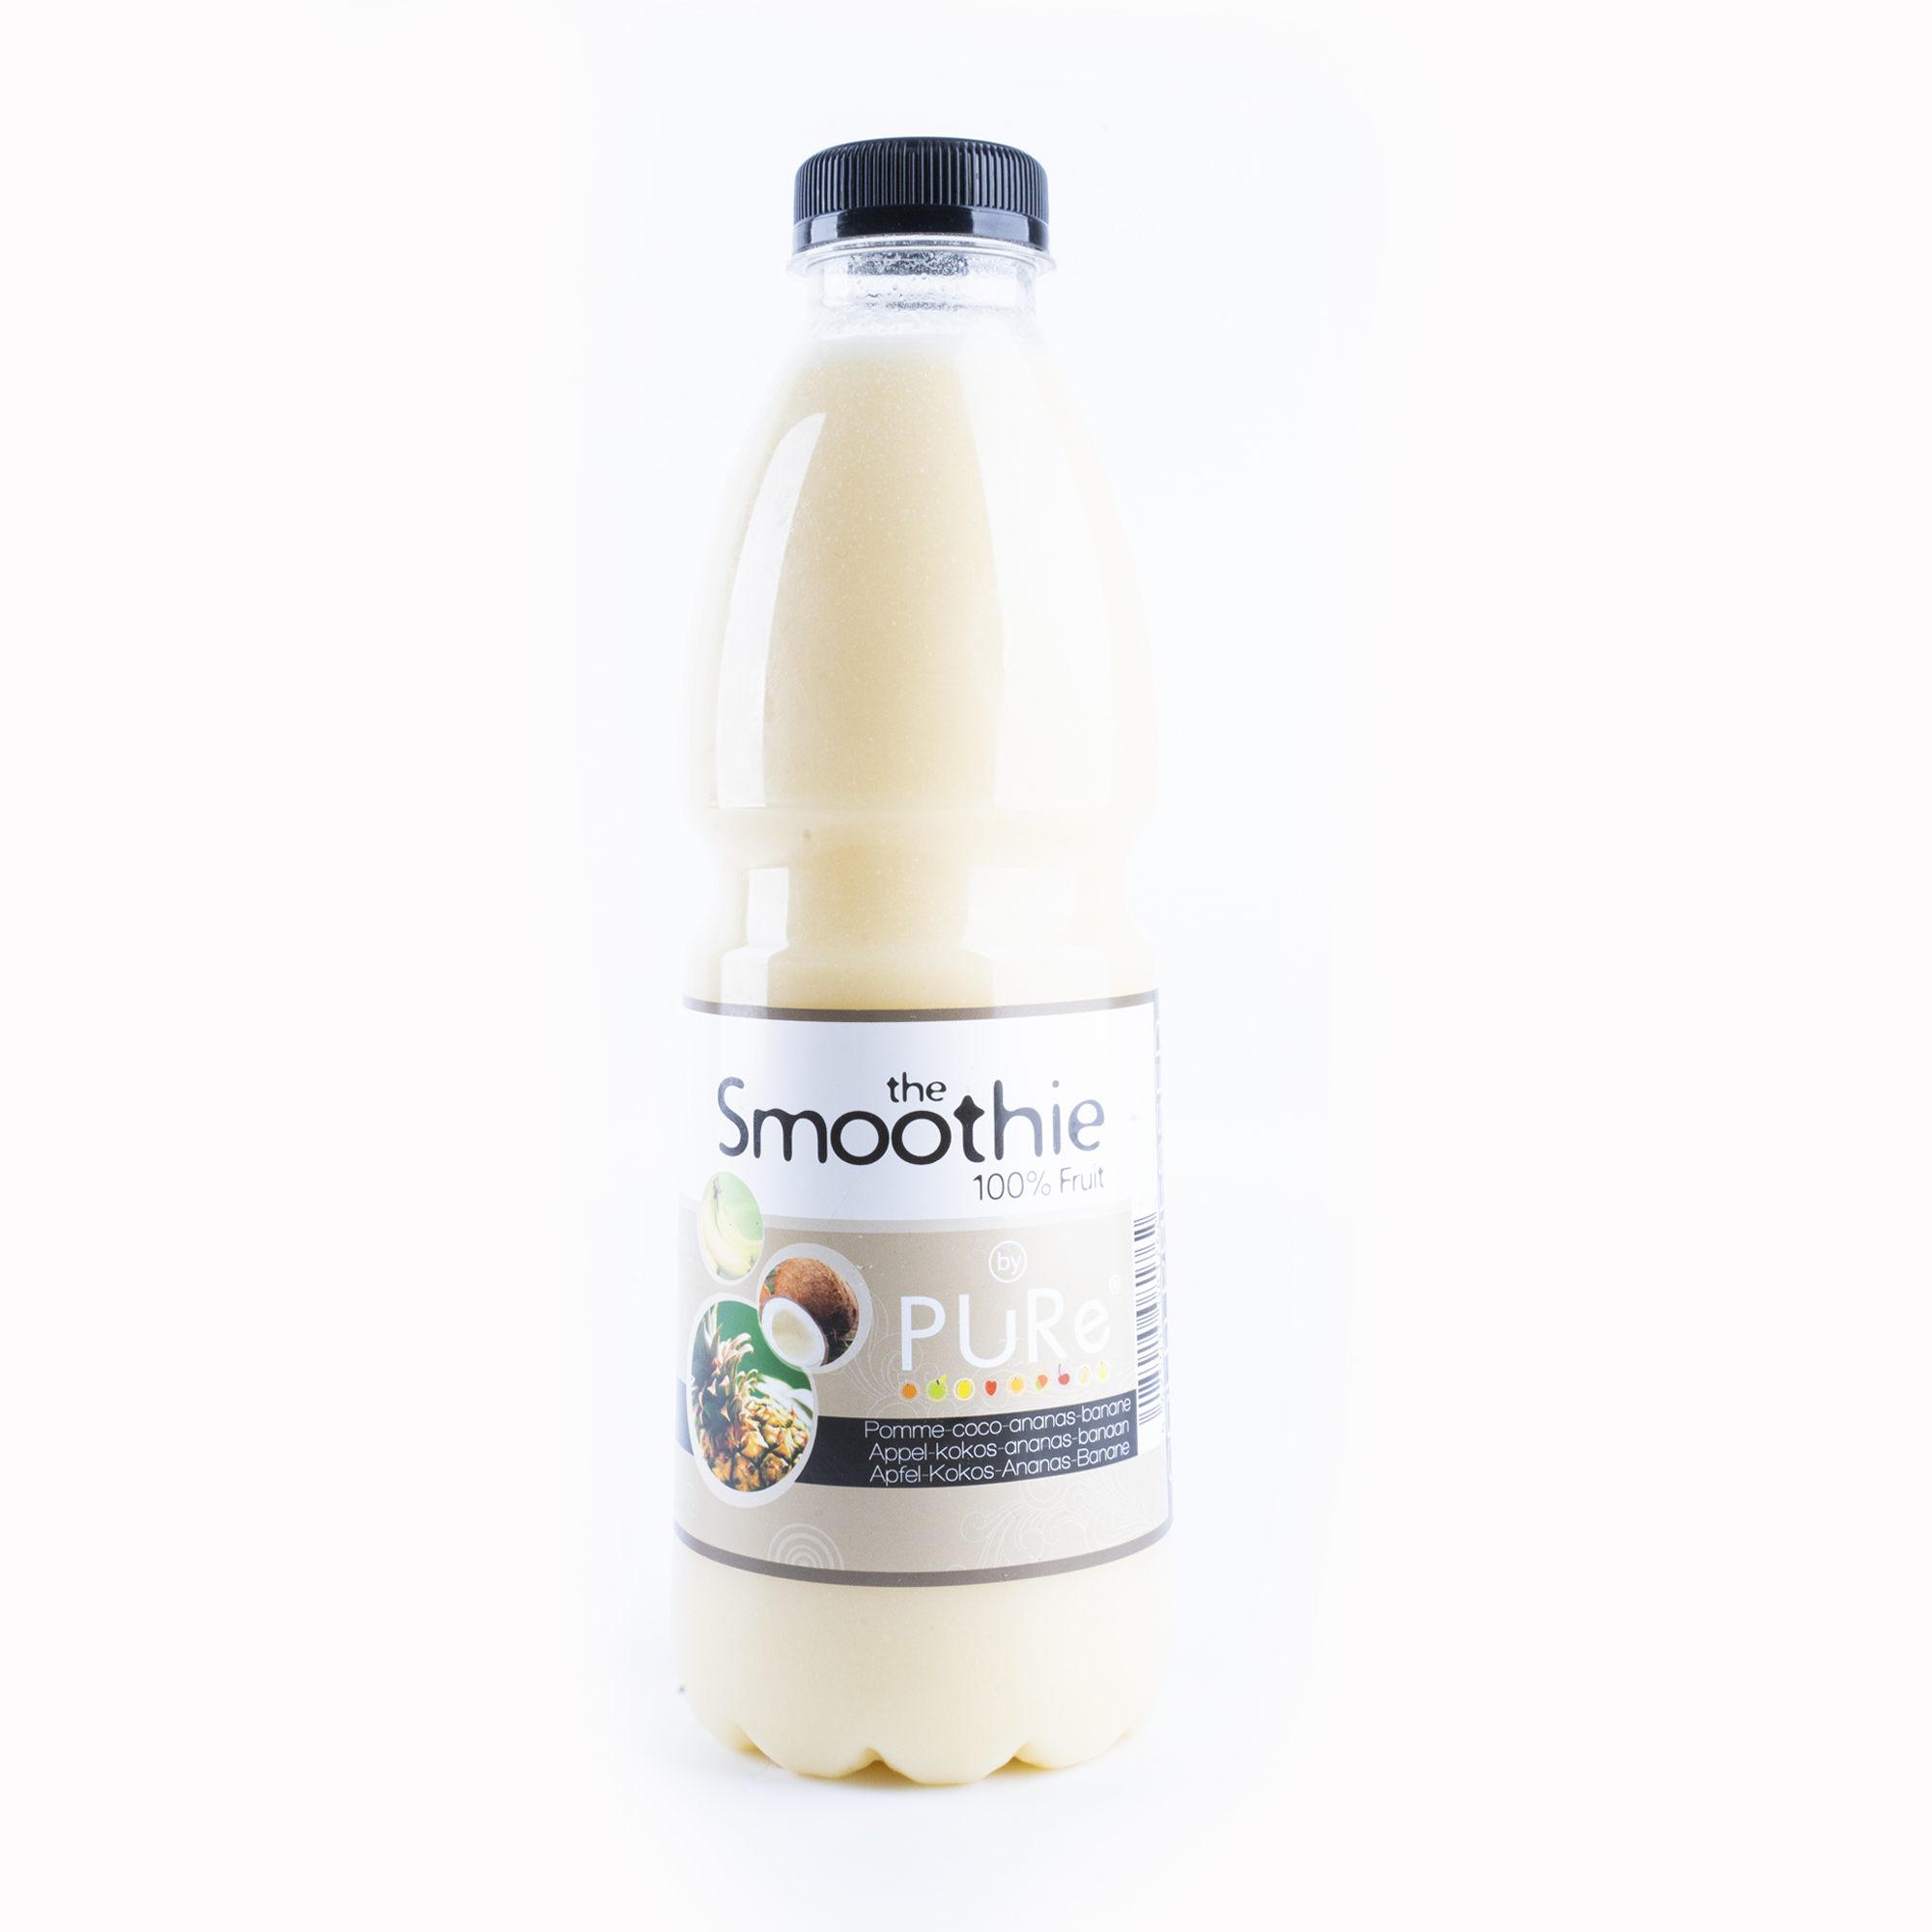 The Juicy Group - Pure - Smoothie van kokos-ananas-banaan - Pure 1L.